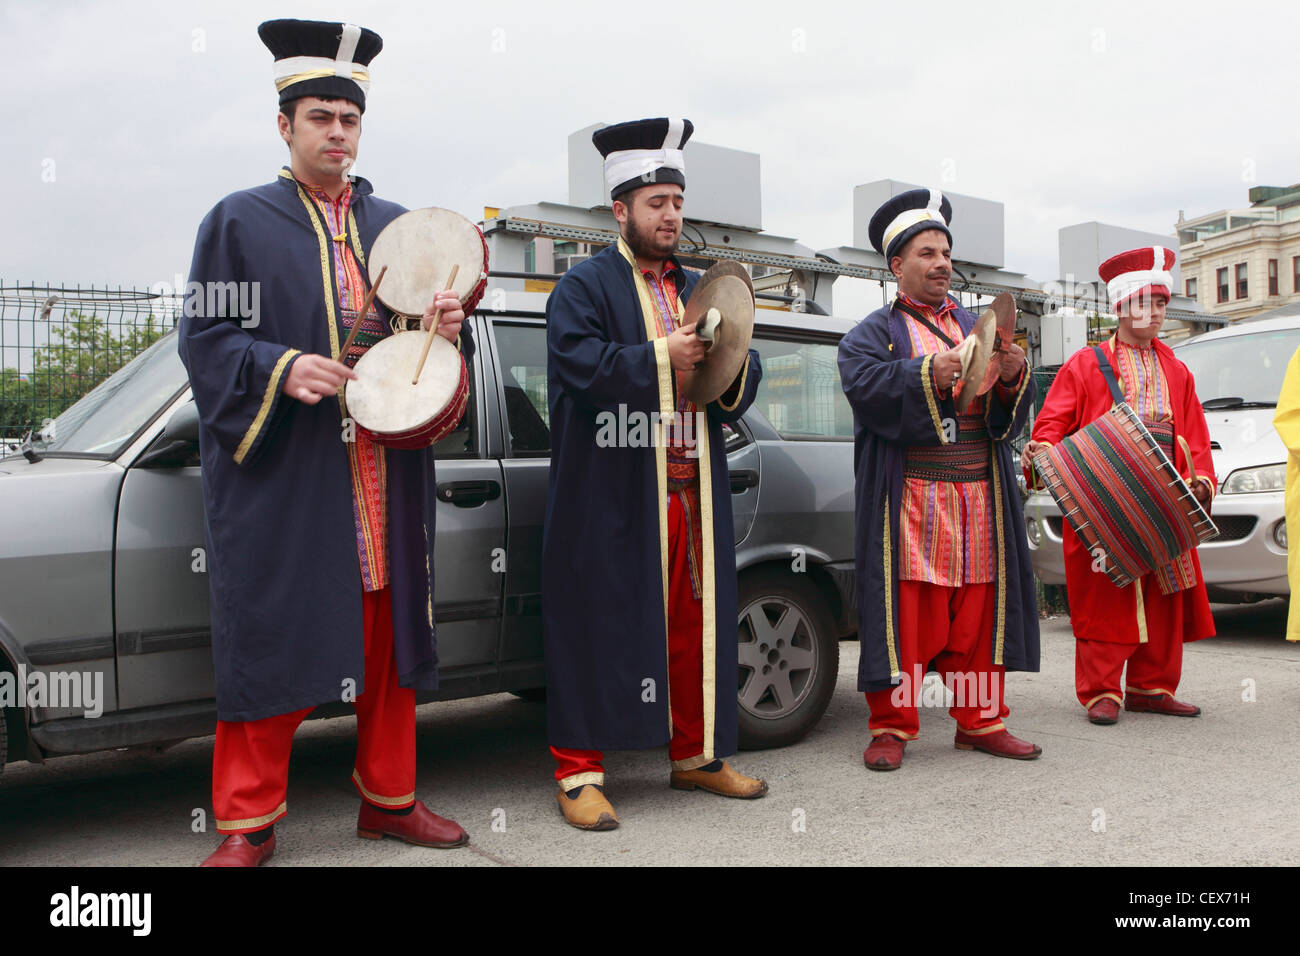 Turkey; Istanbul; street entertainers, musicians, - Stock Image